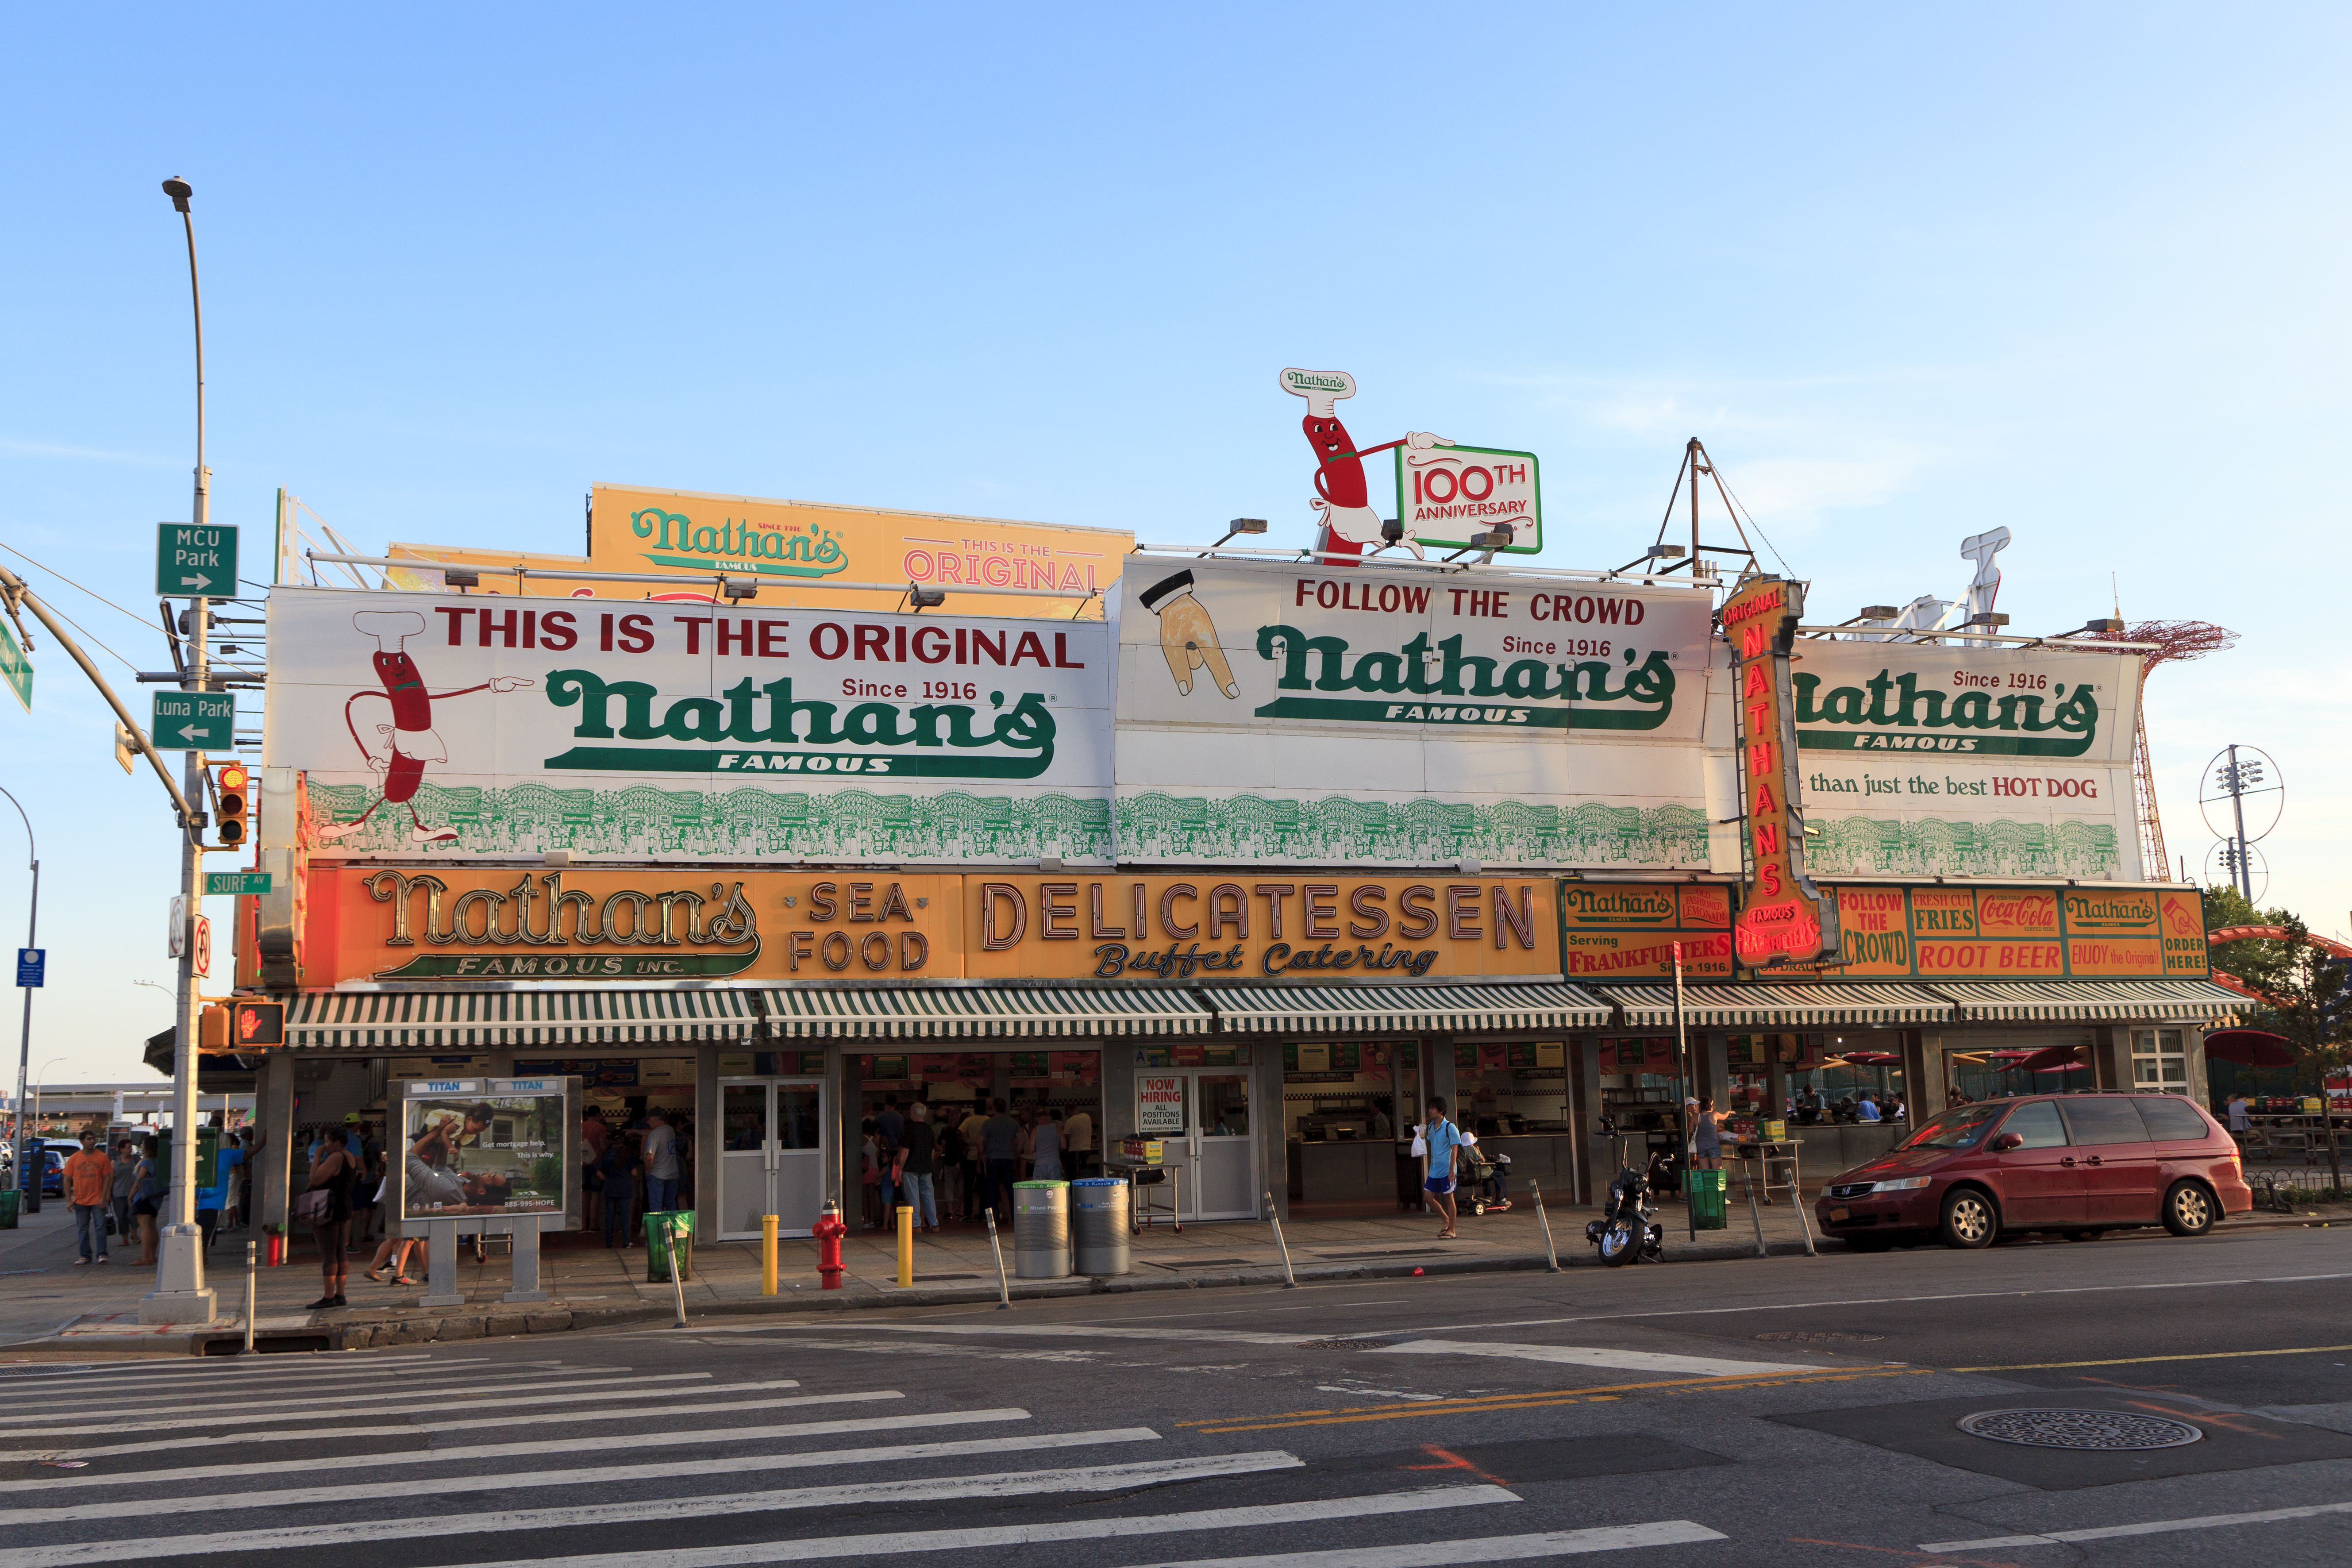 The Nathan's Original Location